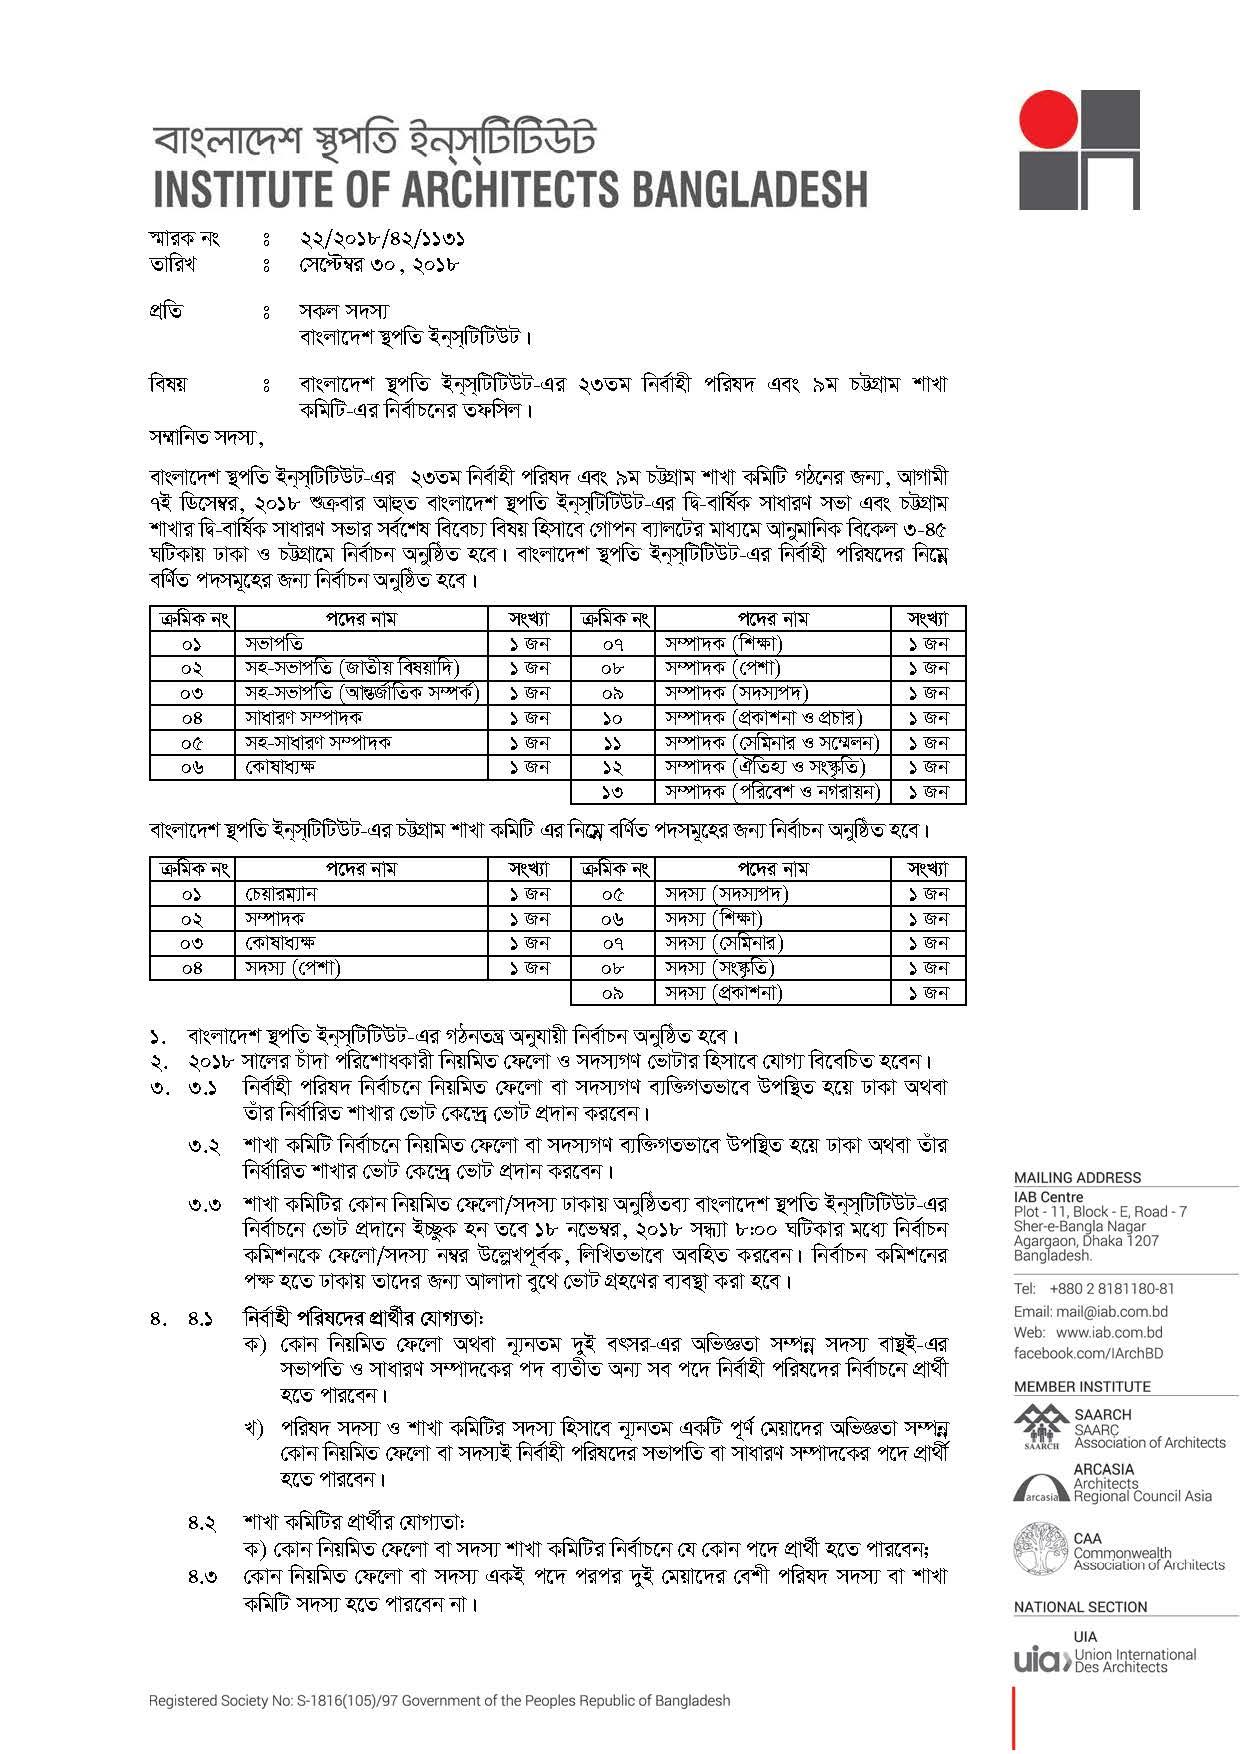 IAB - Institute of Architects Bangladesh | News